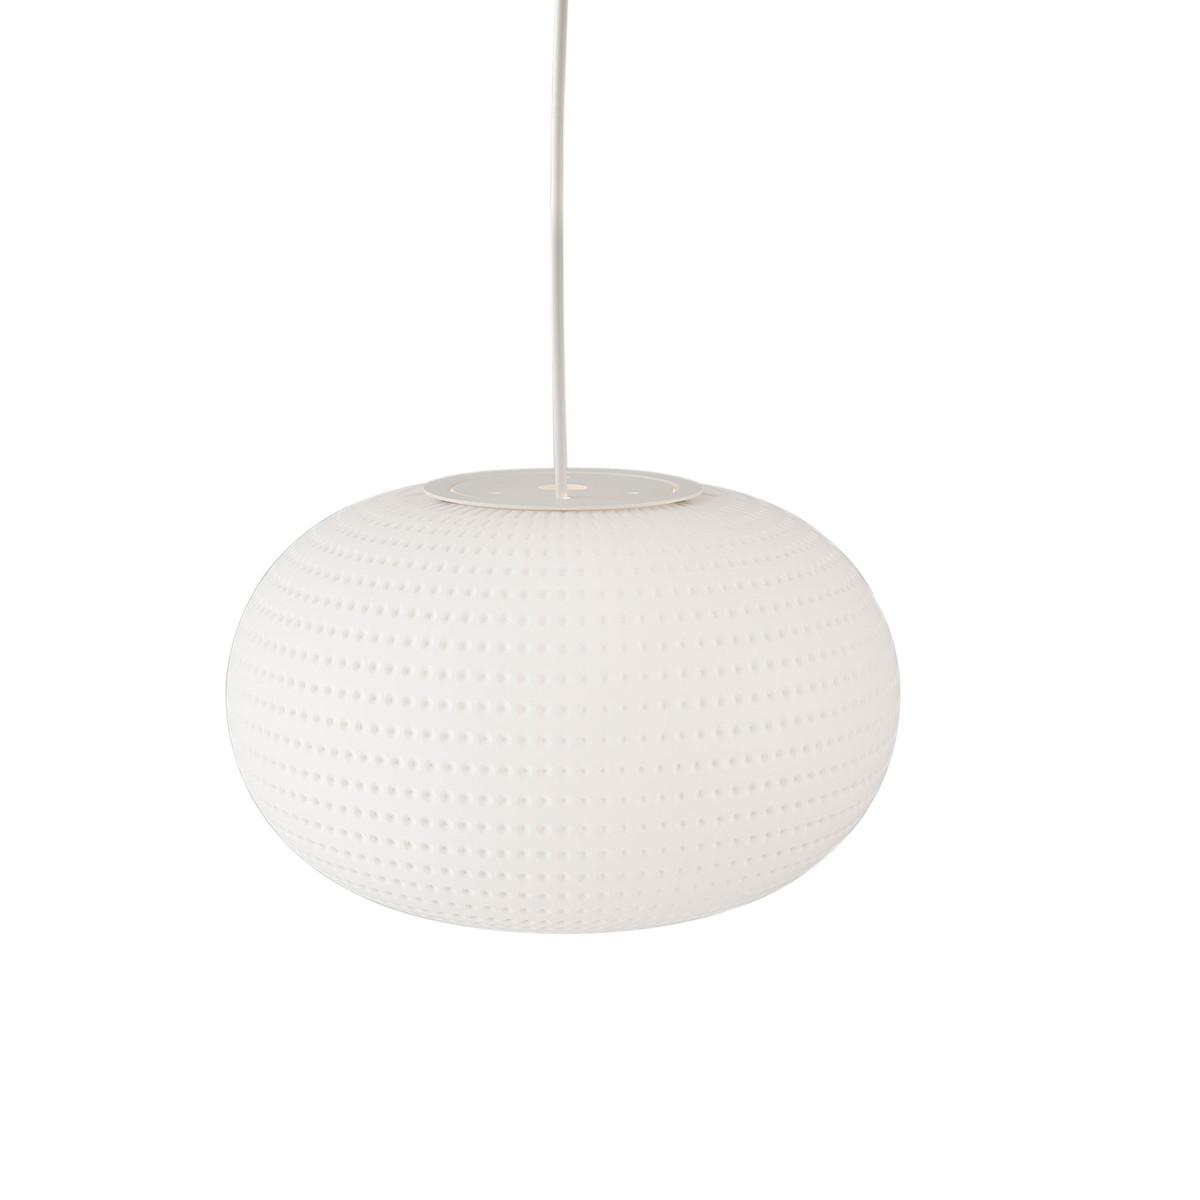 Bianca Lamp Pendant Lamp LED 4,5W 230V